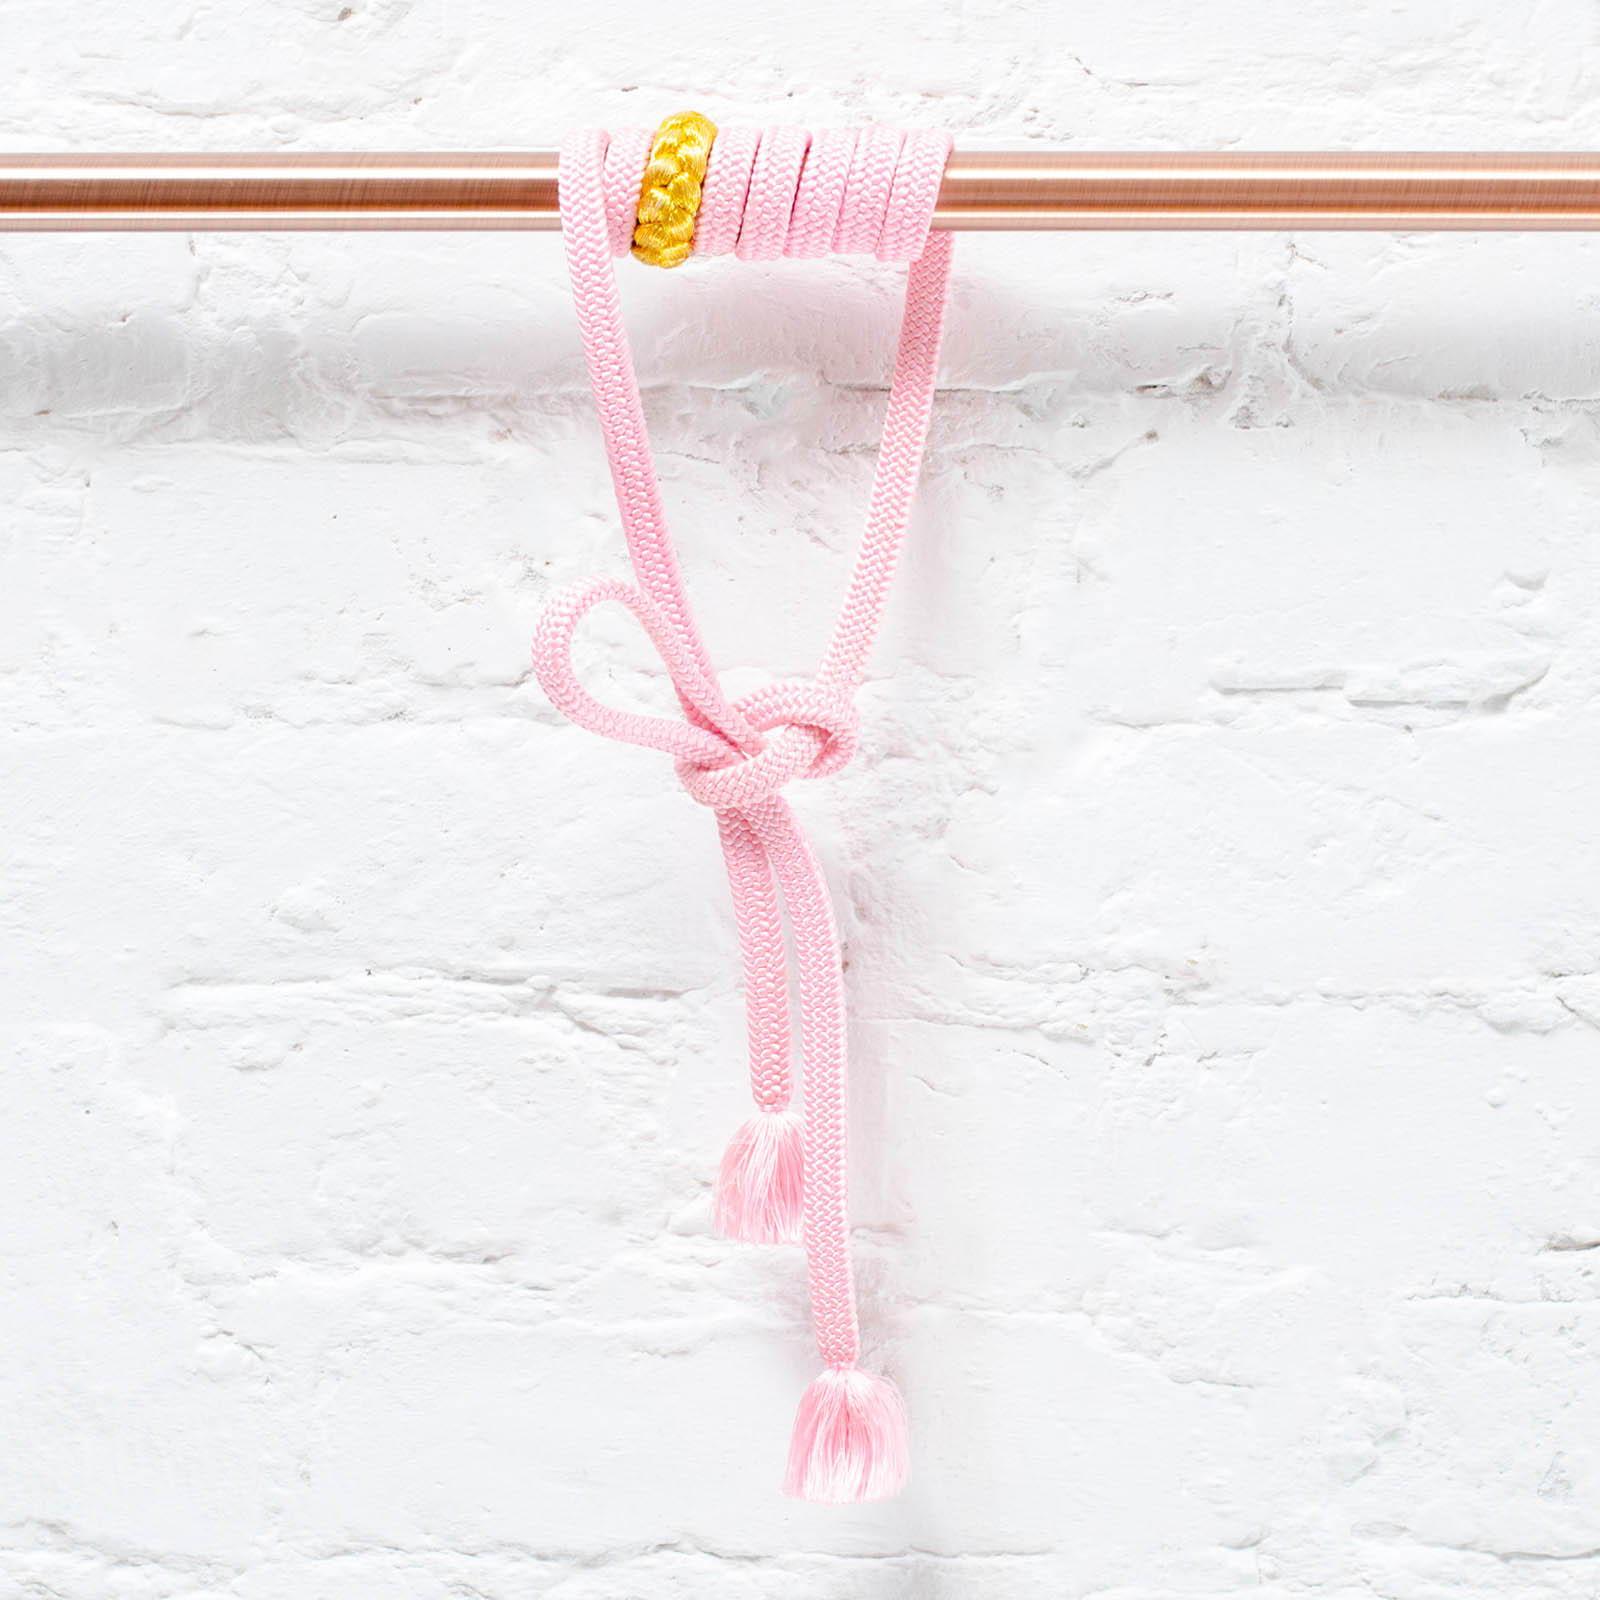 Pink Silk Obijime Belt with Gold Thread Detail Pink Silk Obijime Belt with Gold Thread Detail Pink Silk Obijime Belt with Gold Thread Detail Pink Silk Obijime Belt with Gold Thread Detail    Pink Silk Belt with Gold Thread Detail